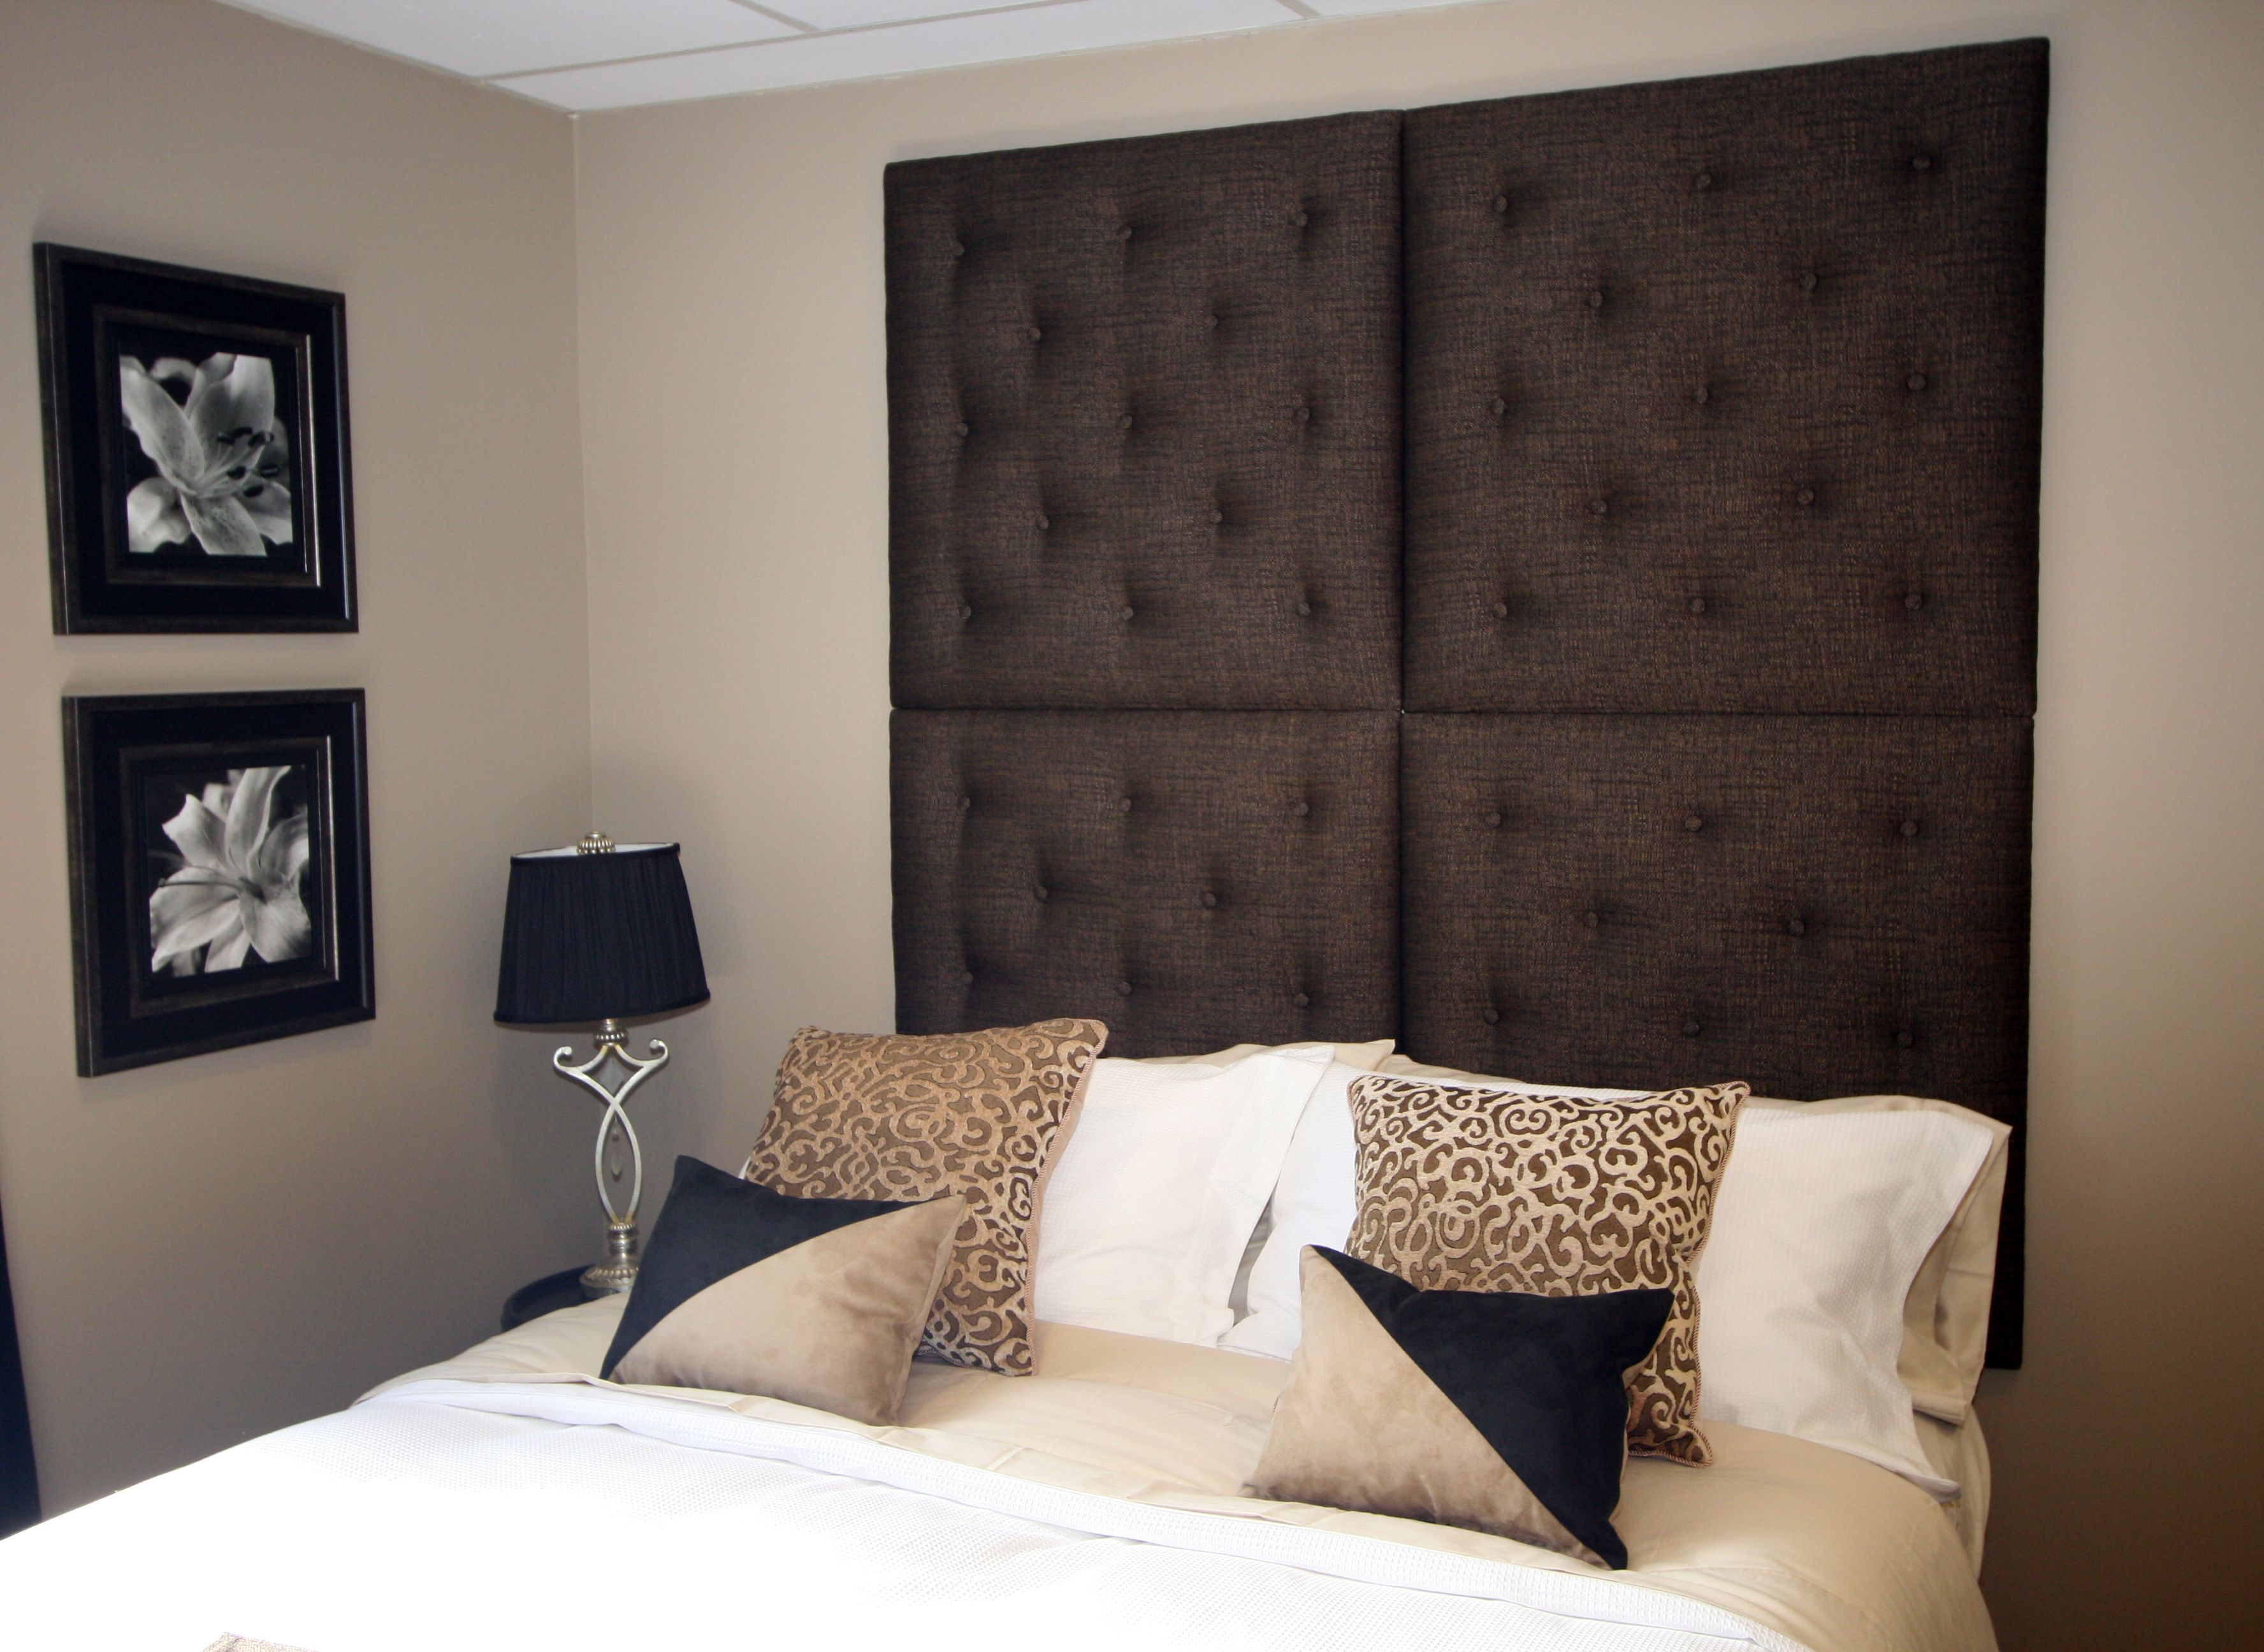 padded walls | Wall Huggers - Designer Chic UPholstered Wall ...